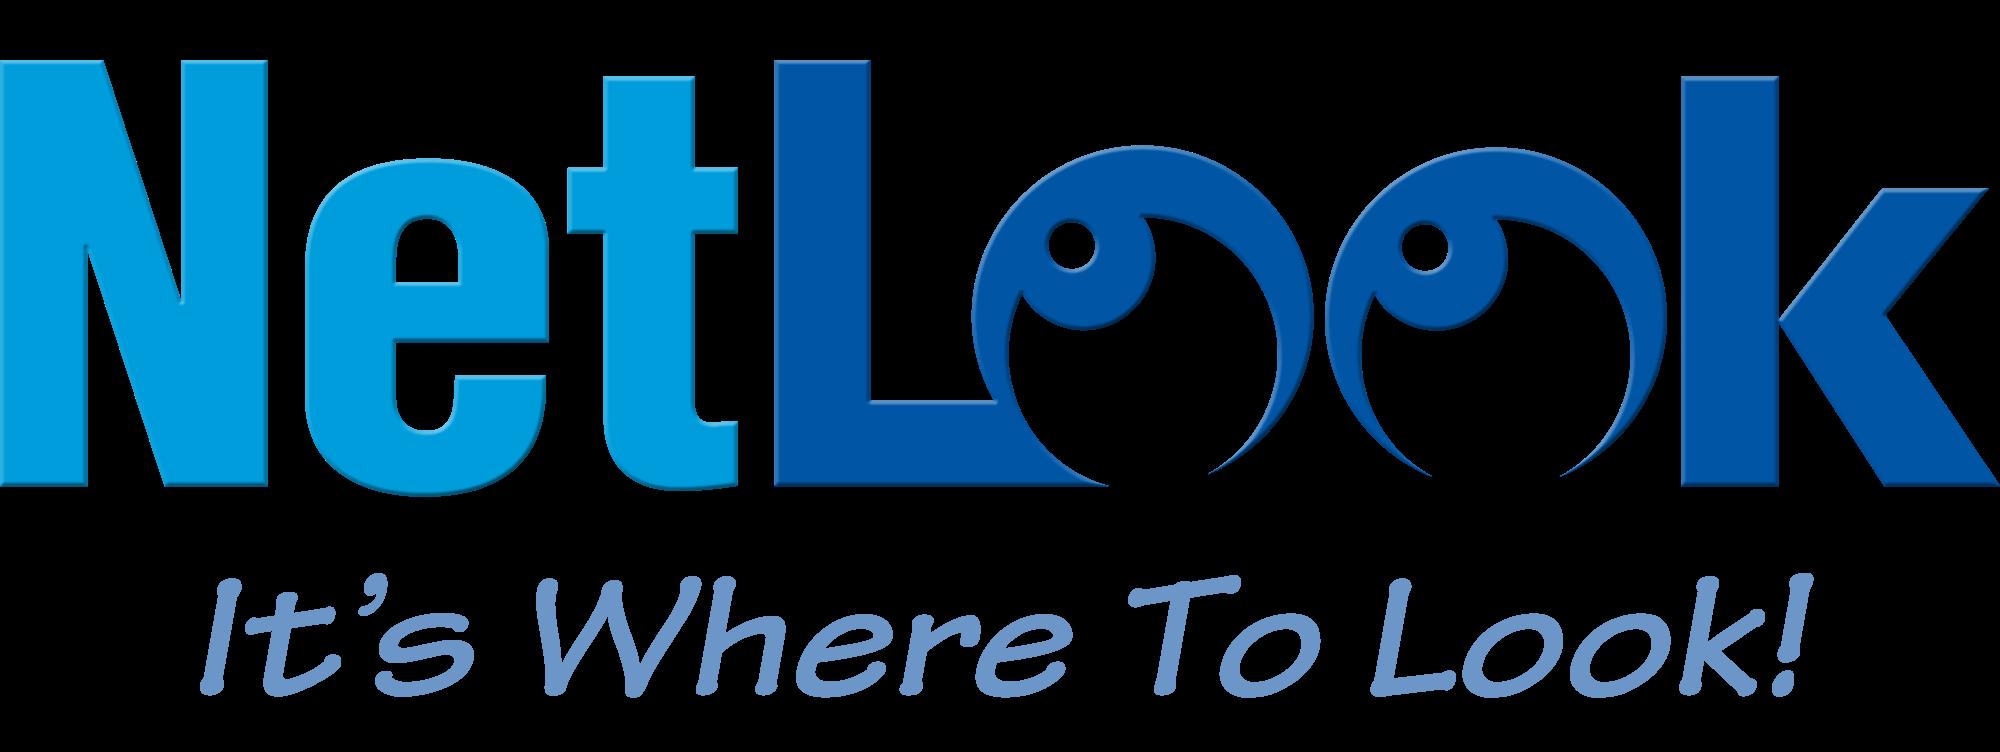 NetLook - It's where to look